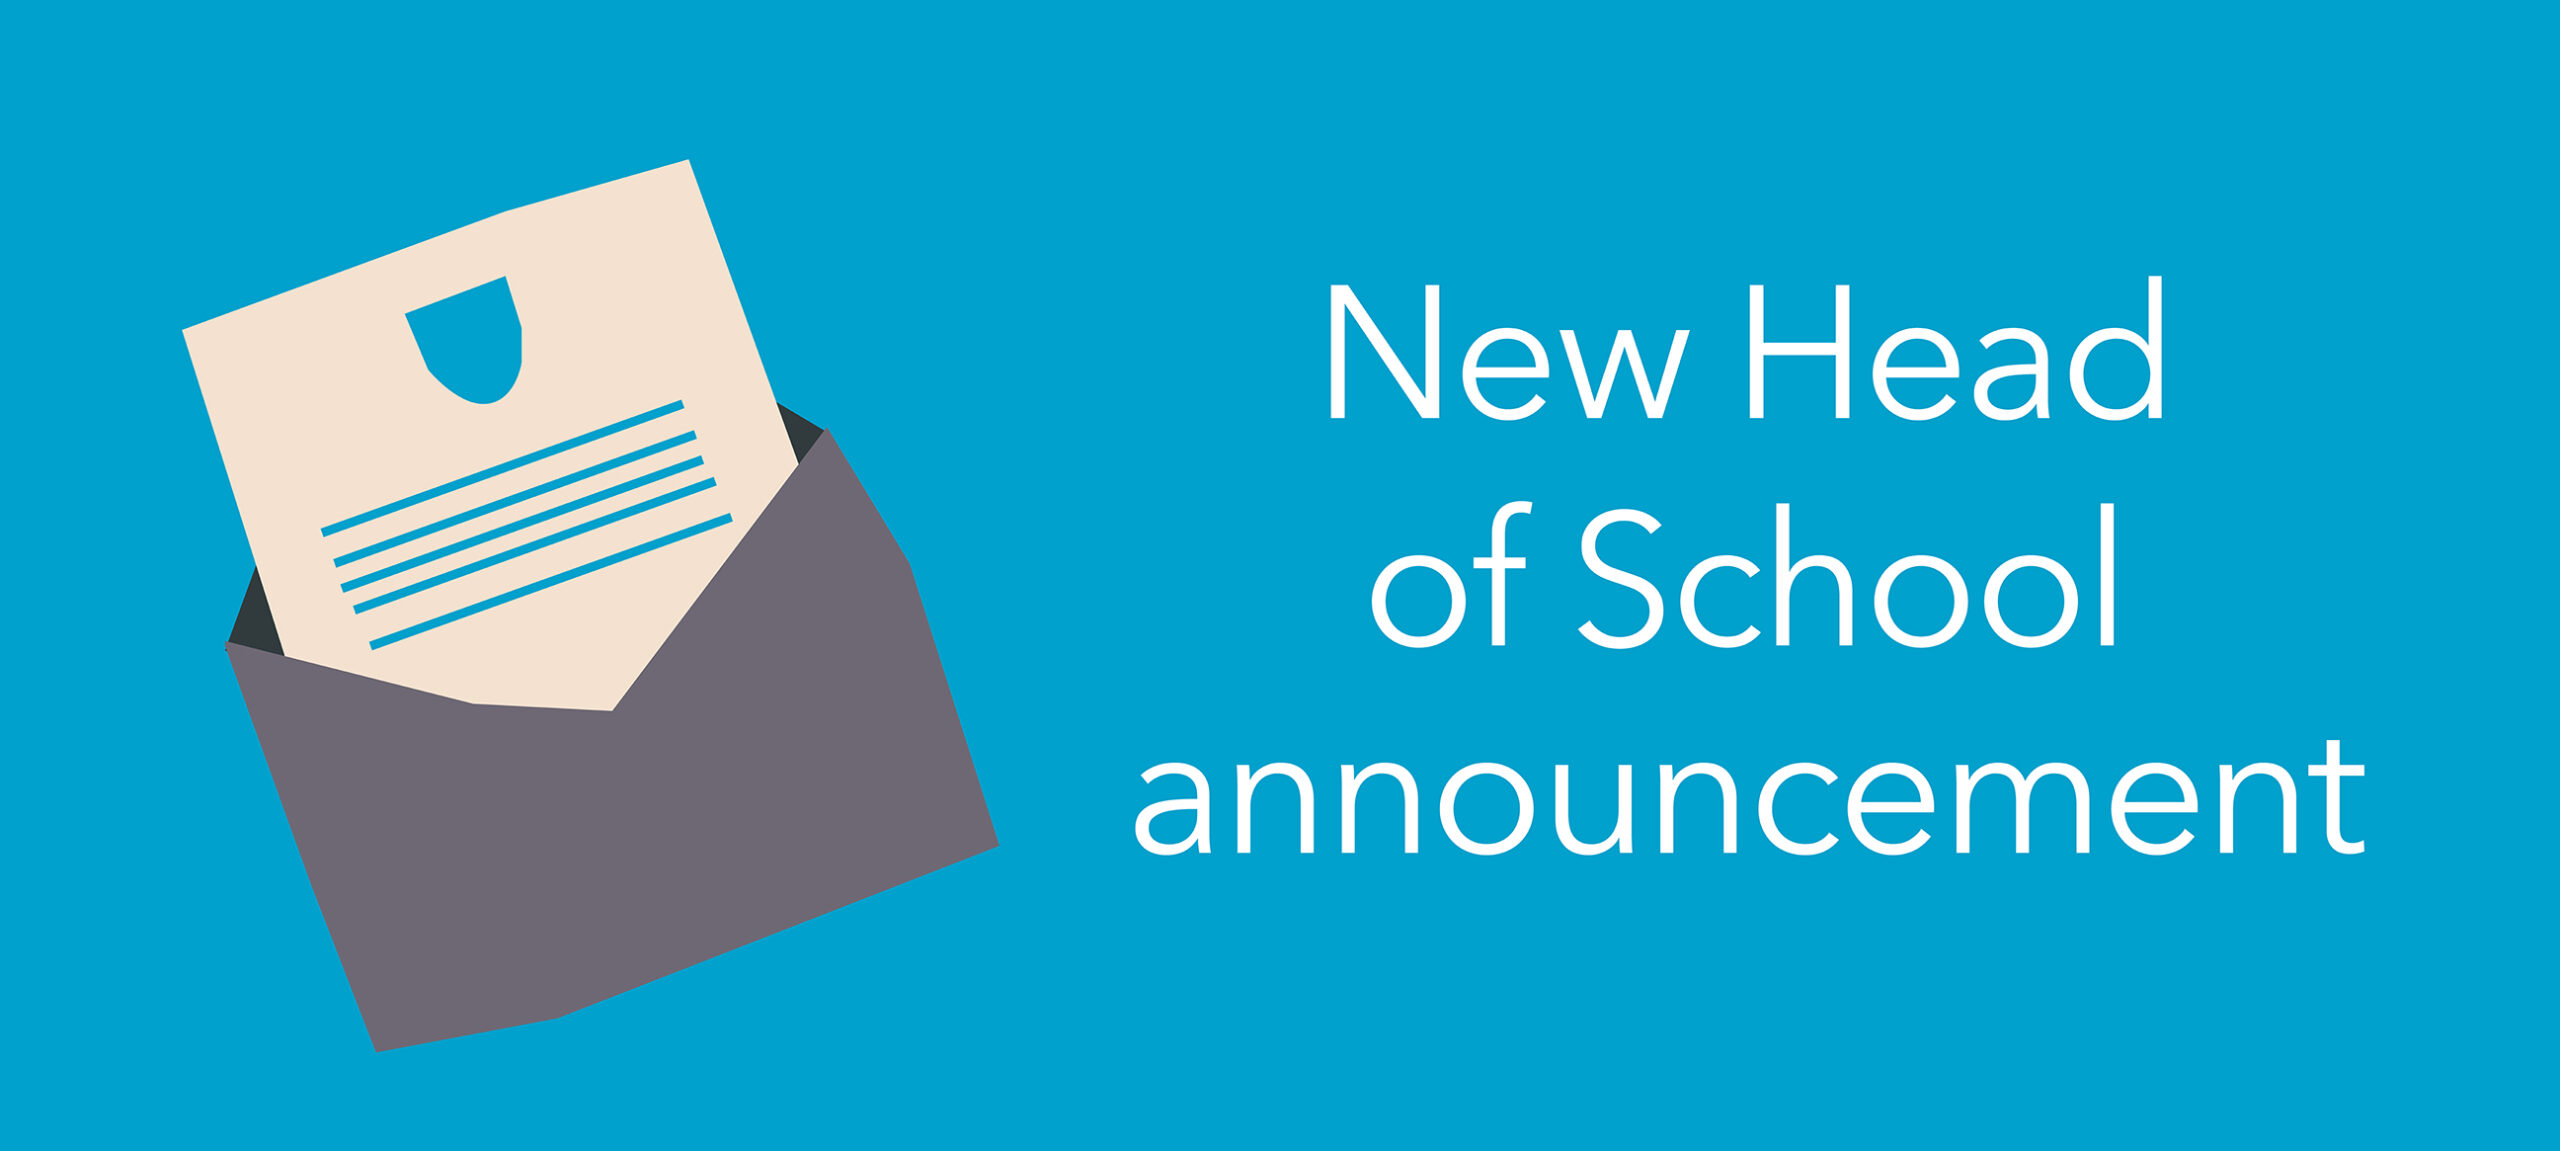 New Head of School announcement